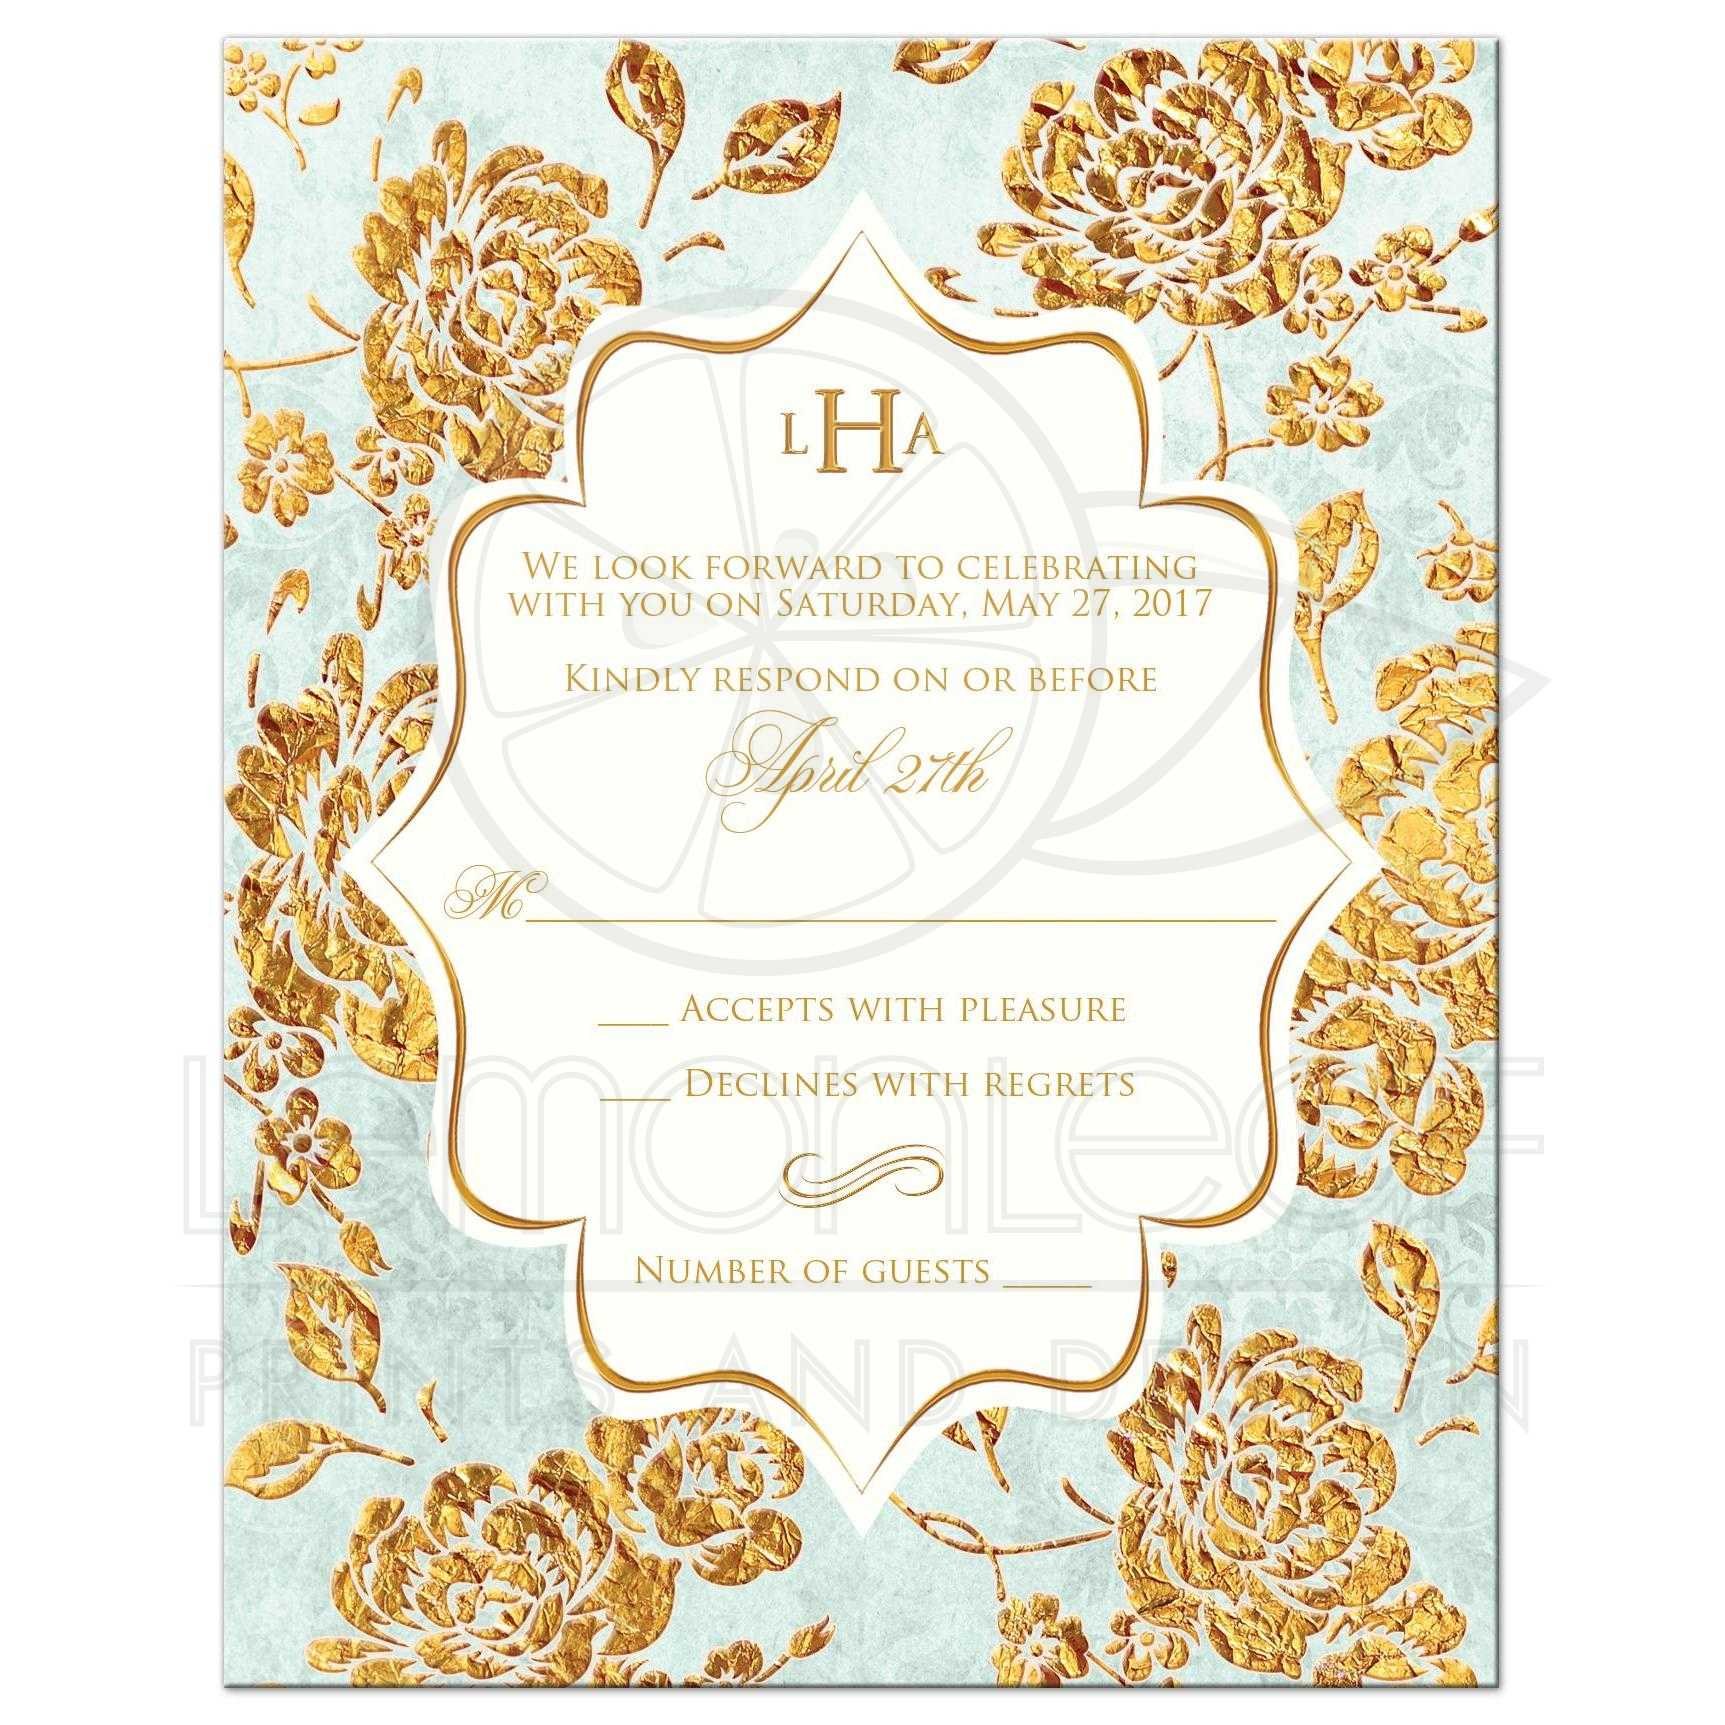 Monogrammed Vintage Floral Wedding Response Card Mint Green Ivory